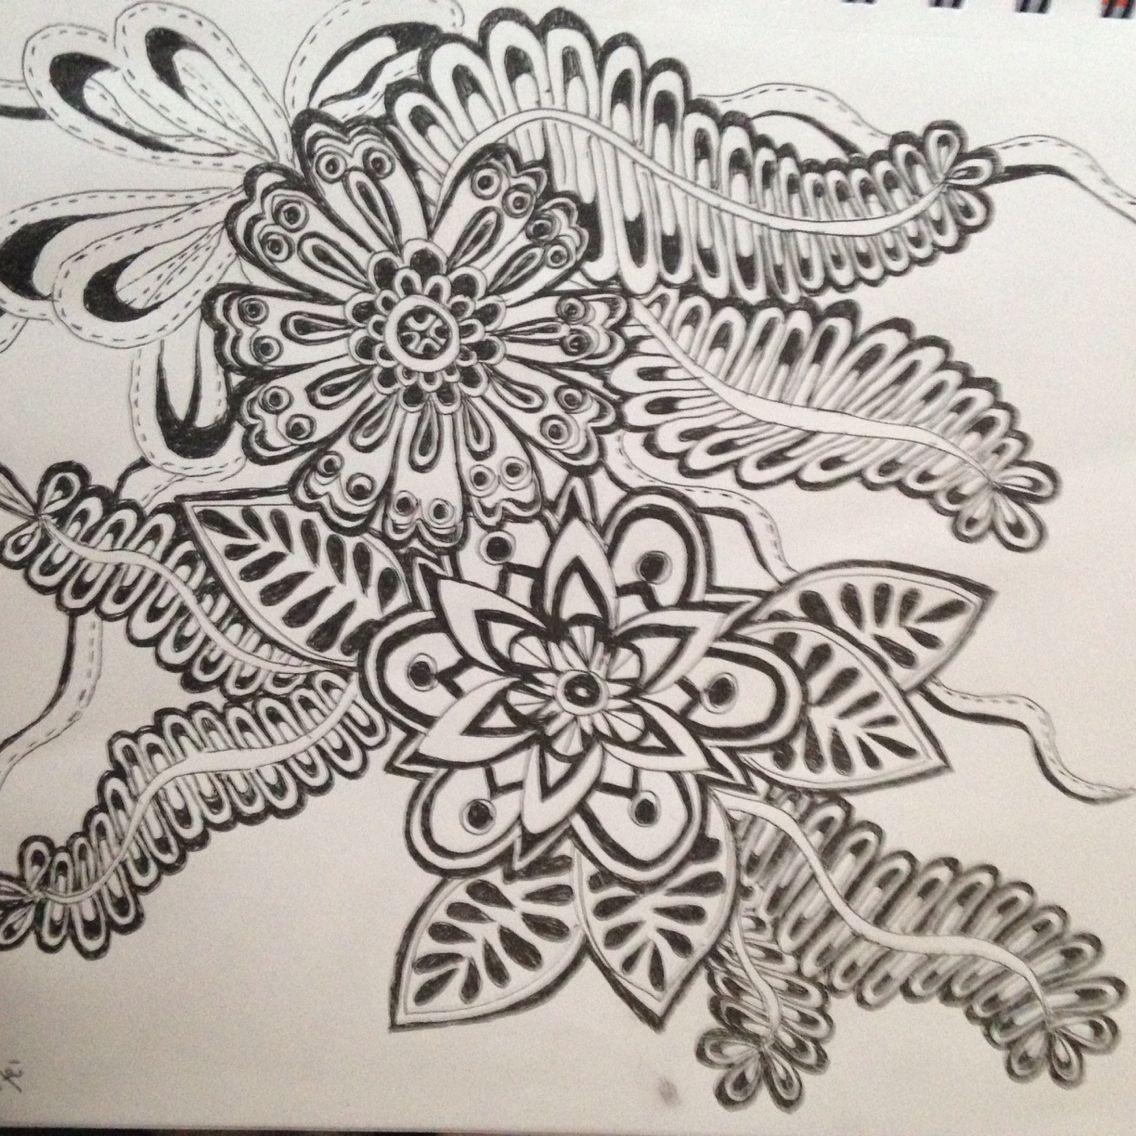 Ink doodles by debra lloyd doodles pinterest doodles by and ink